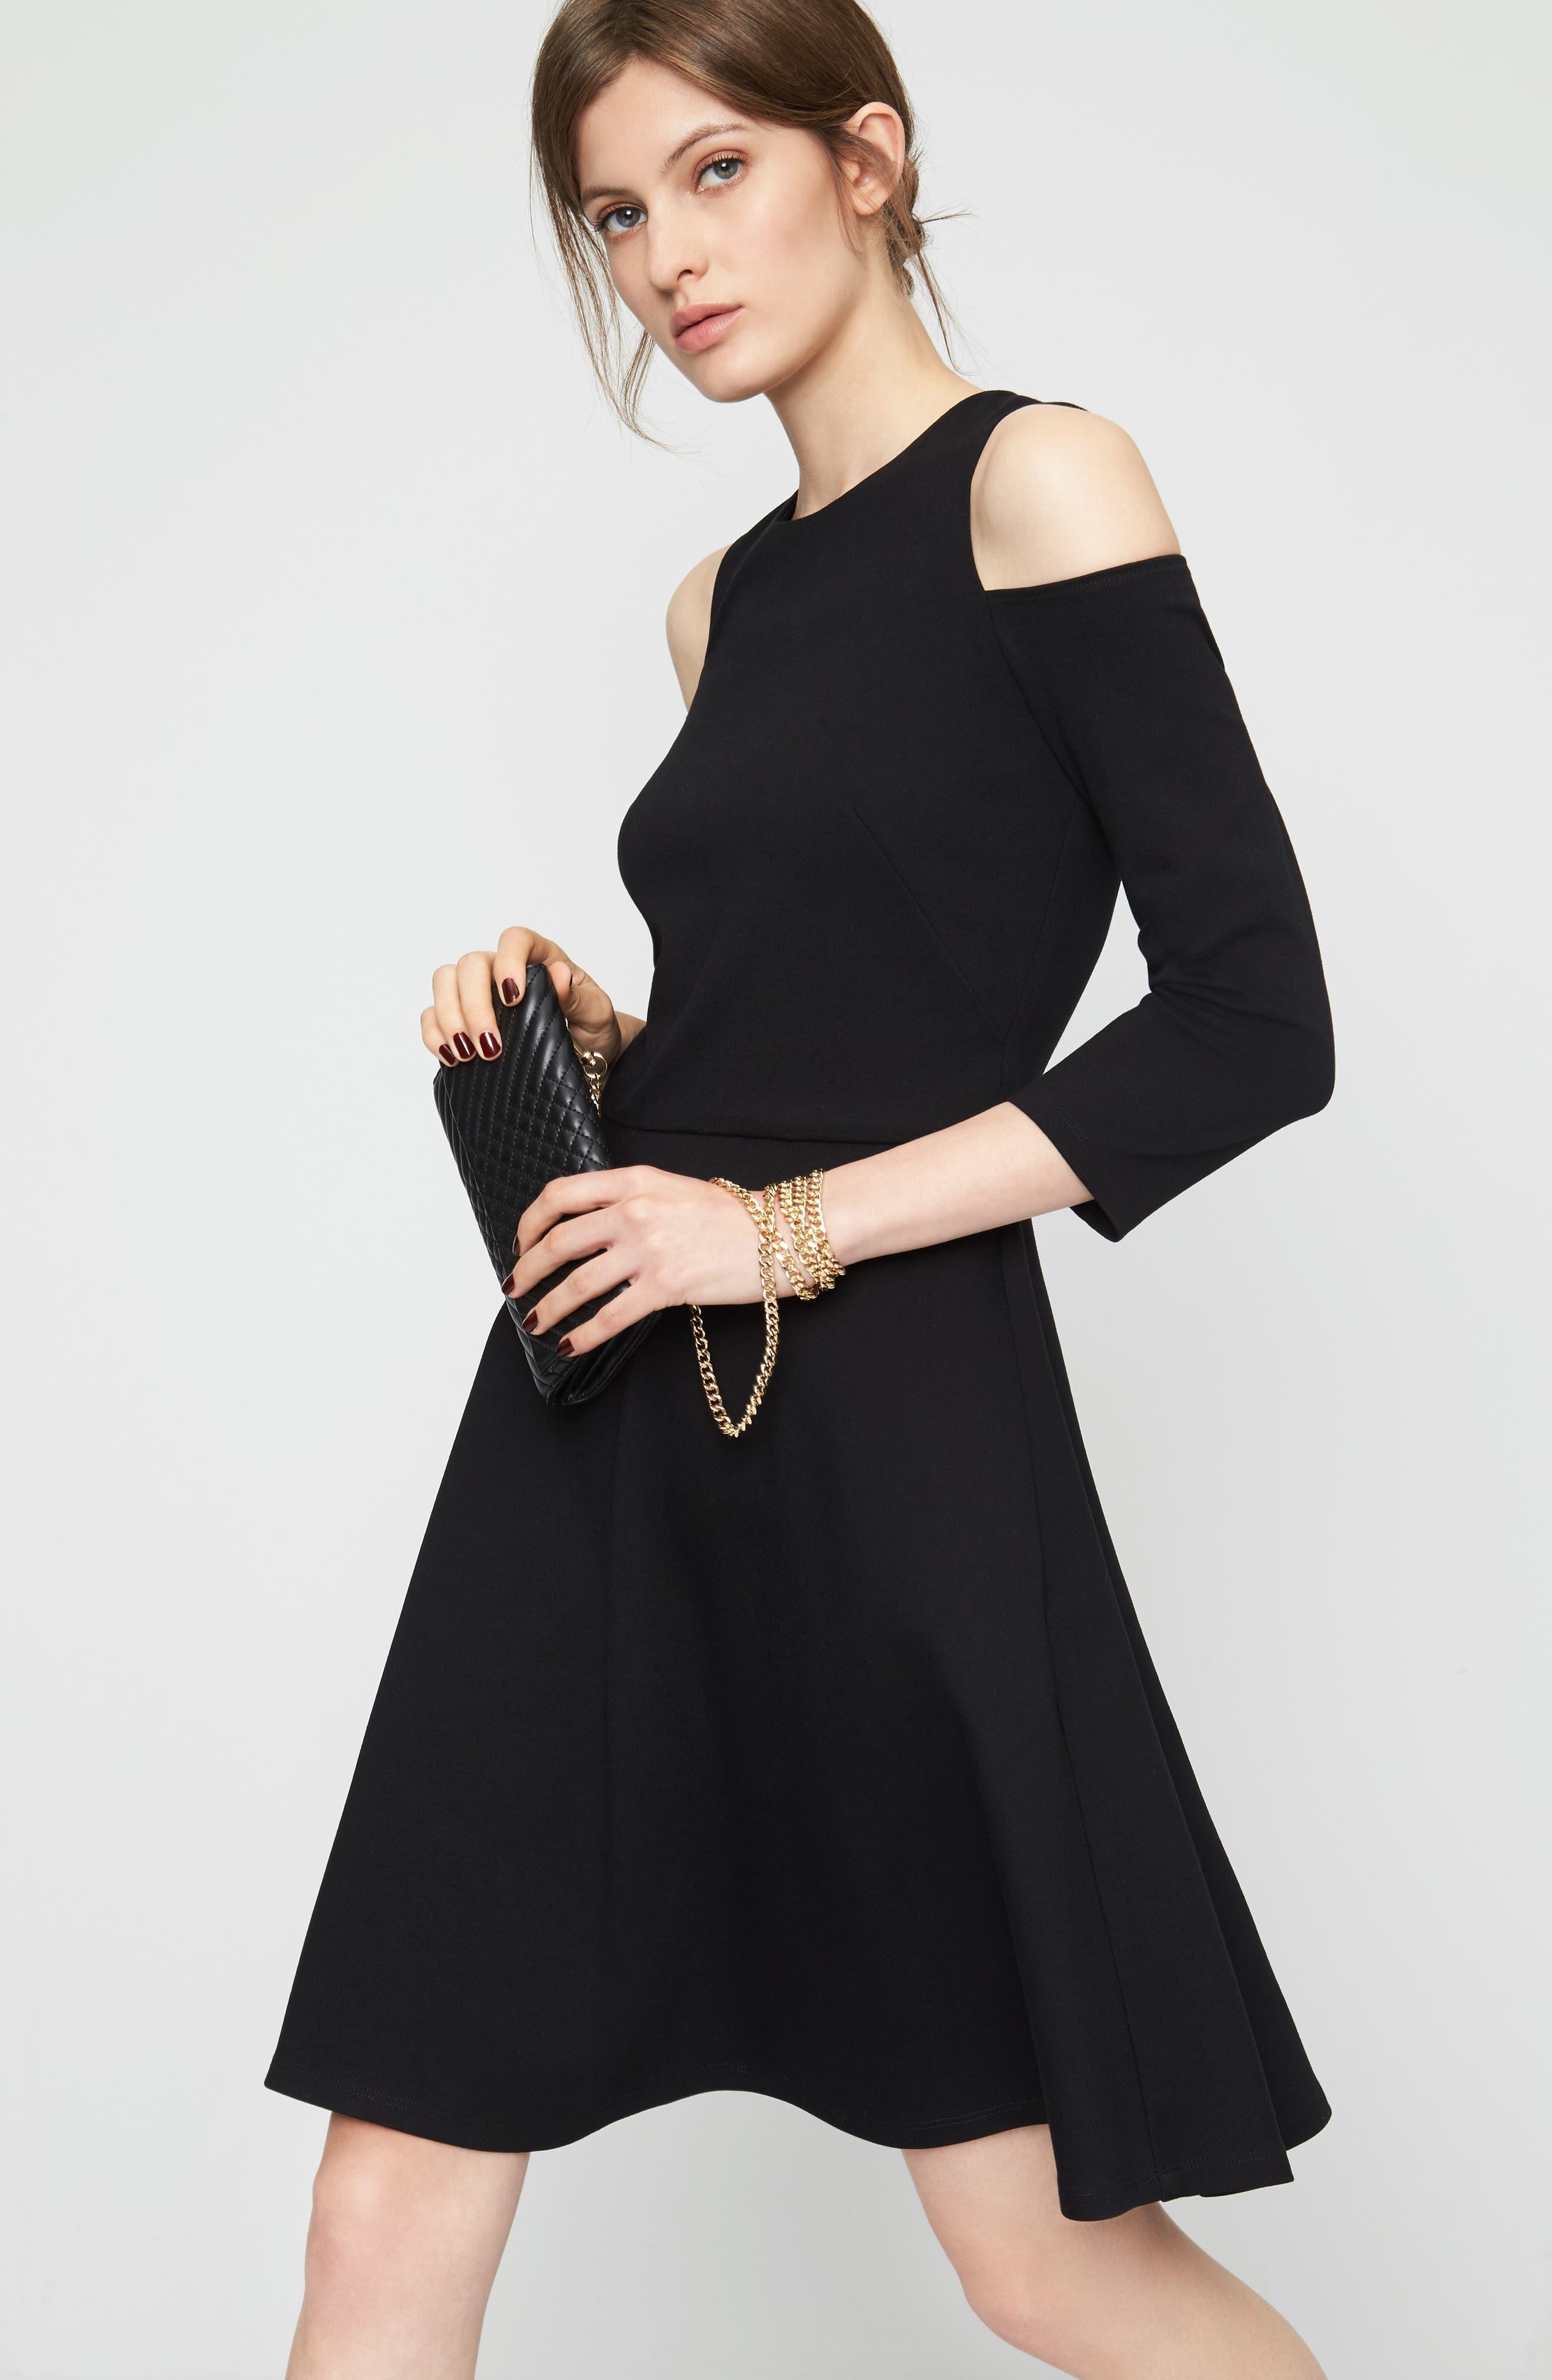 Eliza J Dress with Accessories